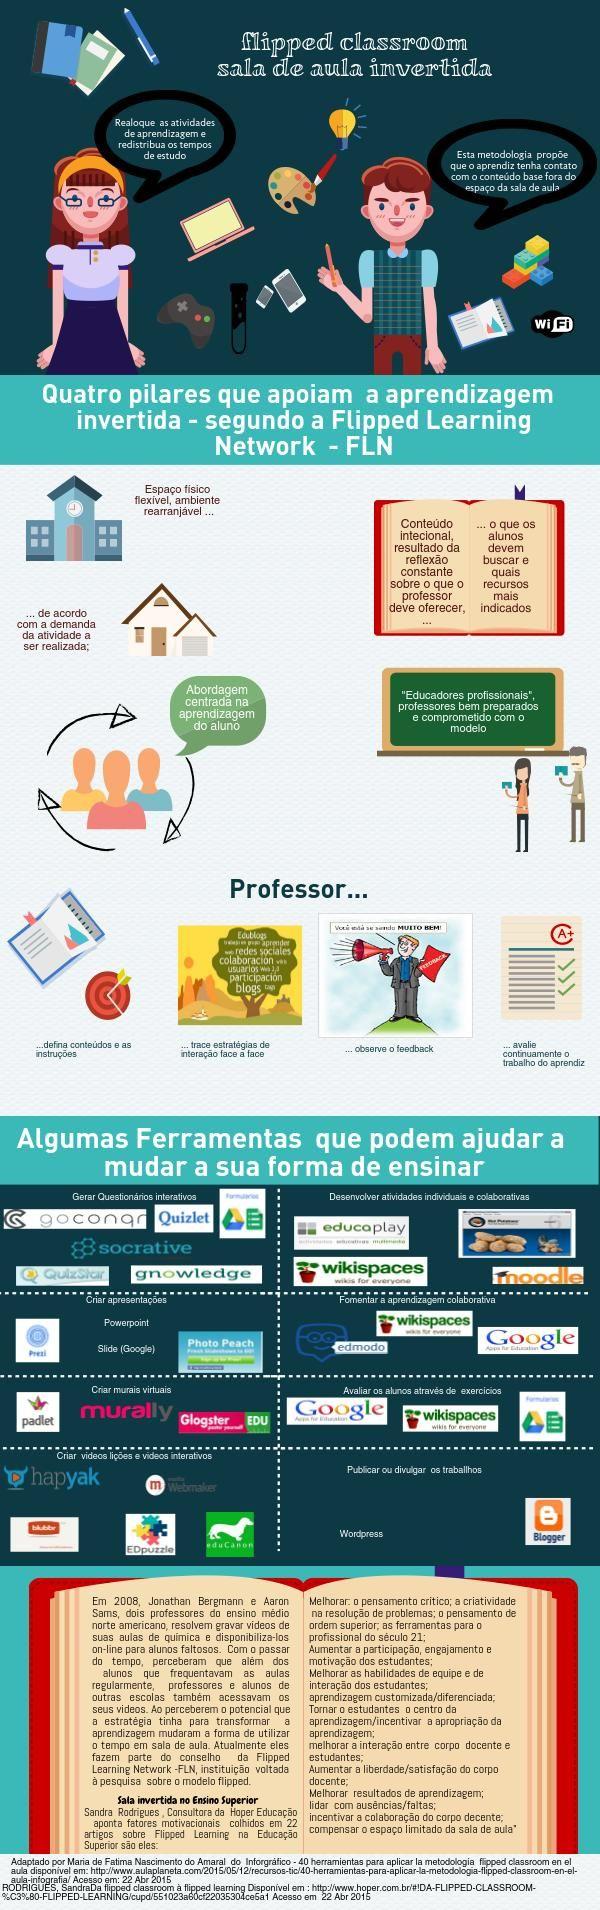 Sala de aula invertida 1 | @Piktochart Infographic